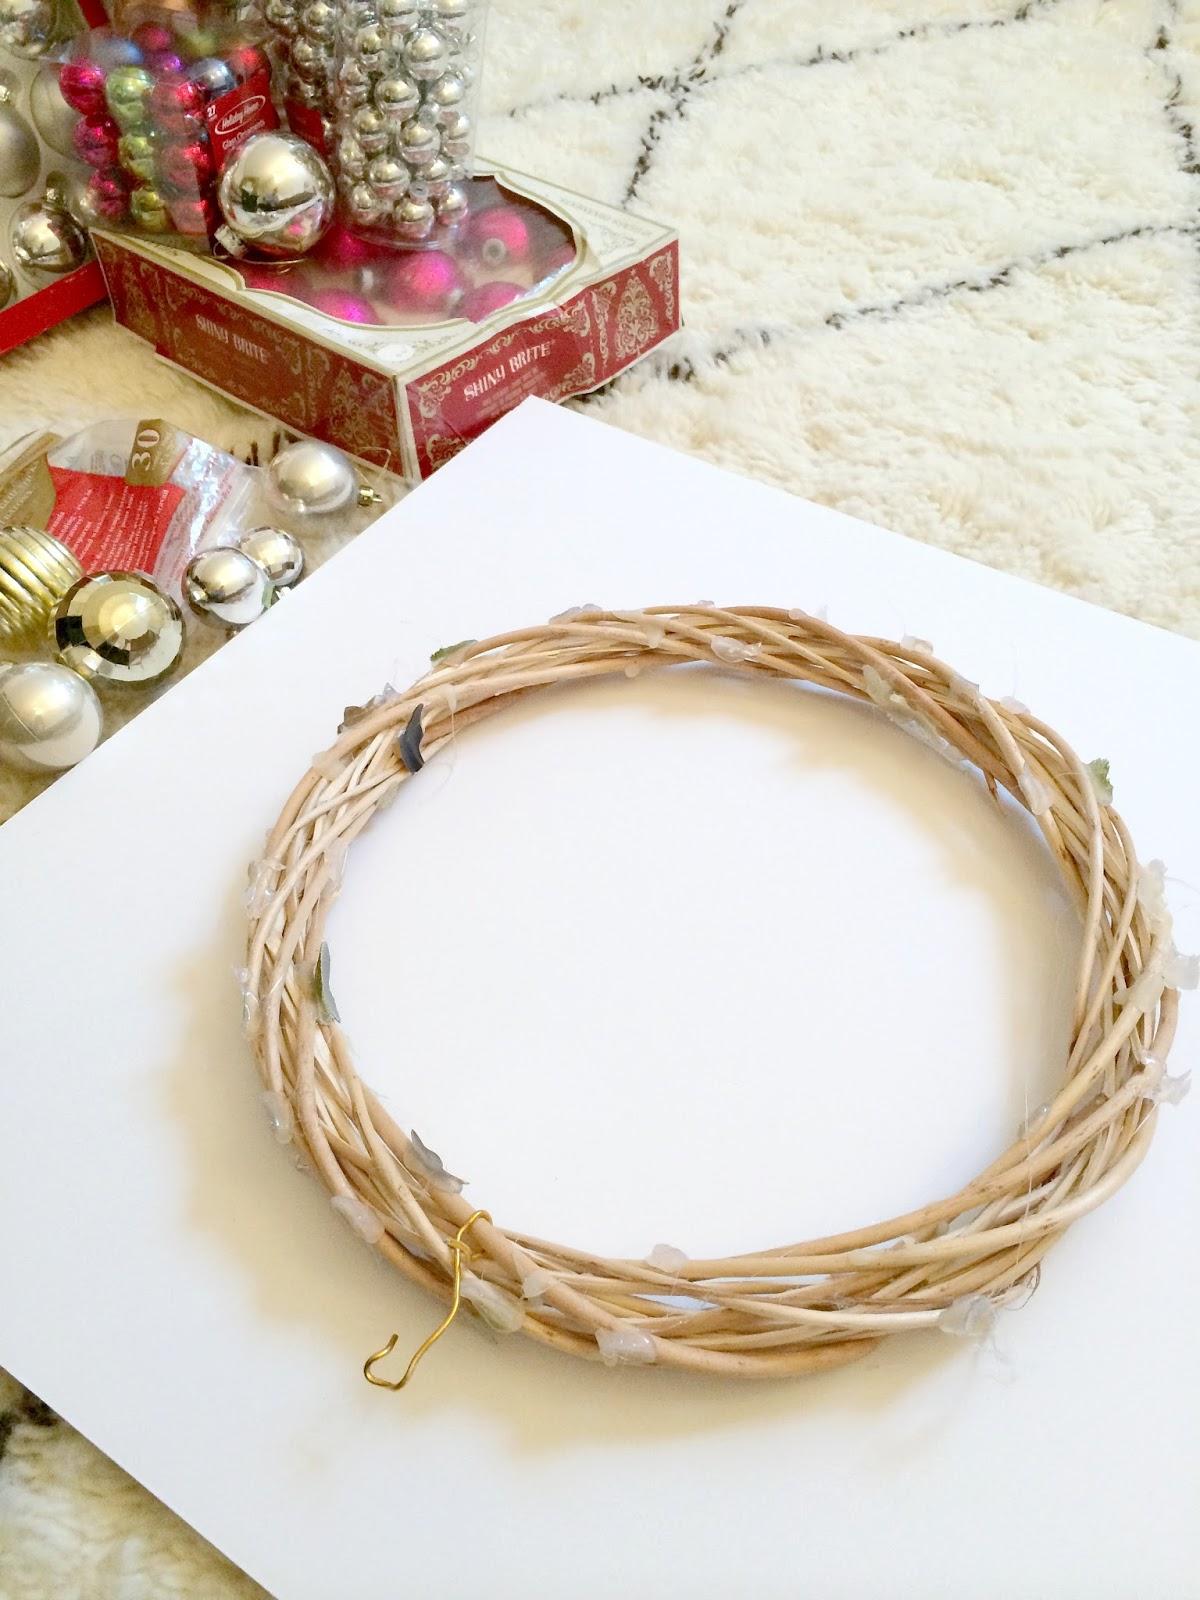 How To Make A Christmas Ornament Wreath Livelovediy Bloglovin